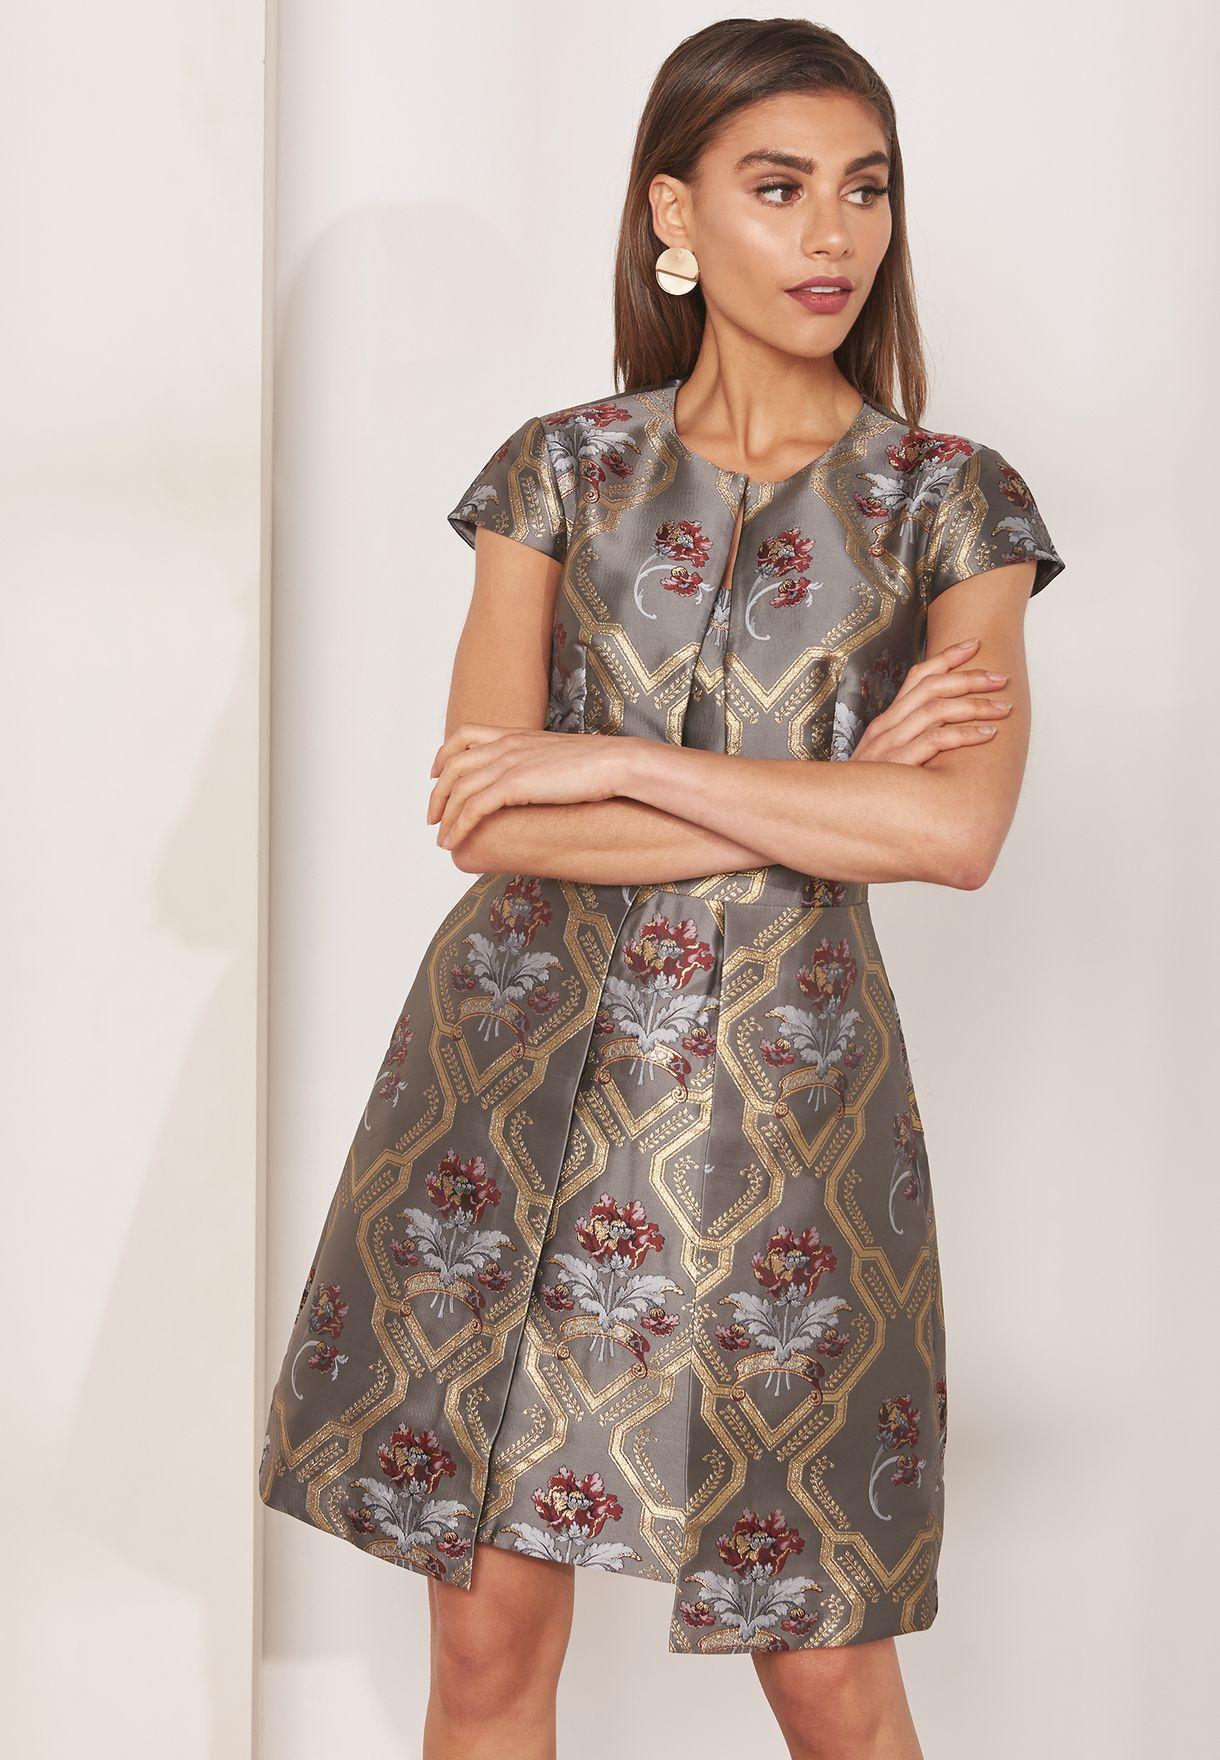 cfd69225cc32 Shop Ted baker prints Kkaty Short Sleeve Skater Dress 150567 for ...